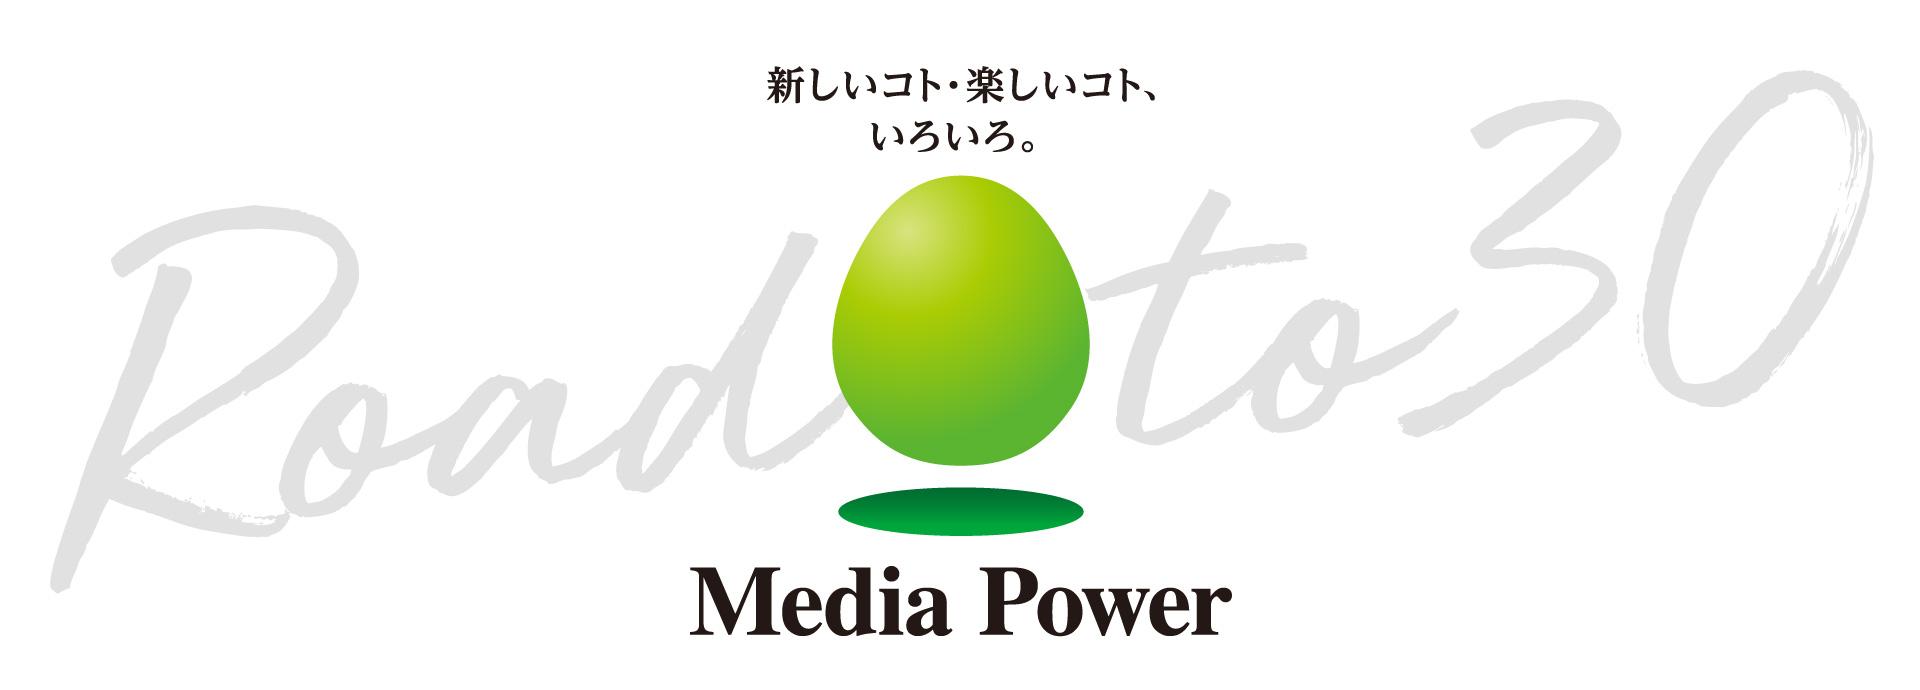 Road to 30 新しいコト・楽しいコト、いろいろ。Media Power